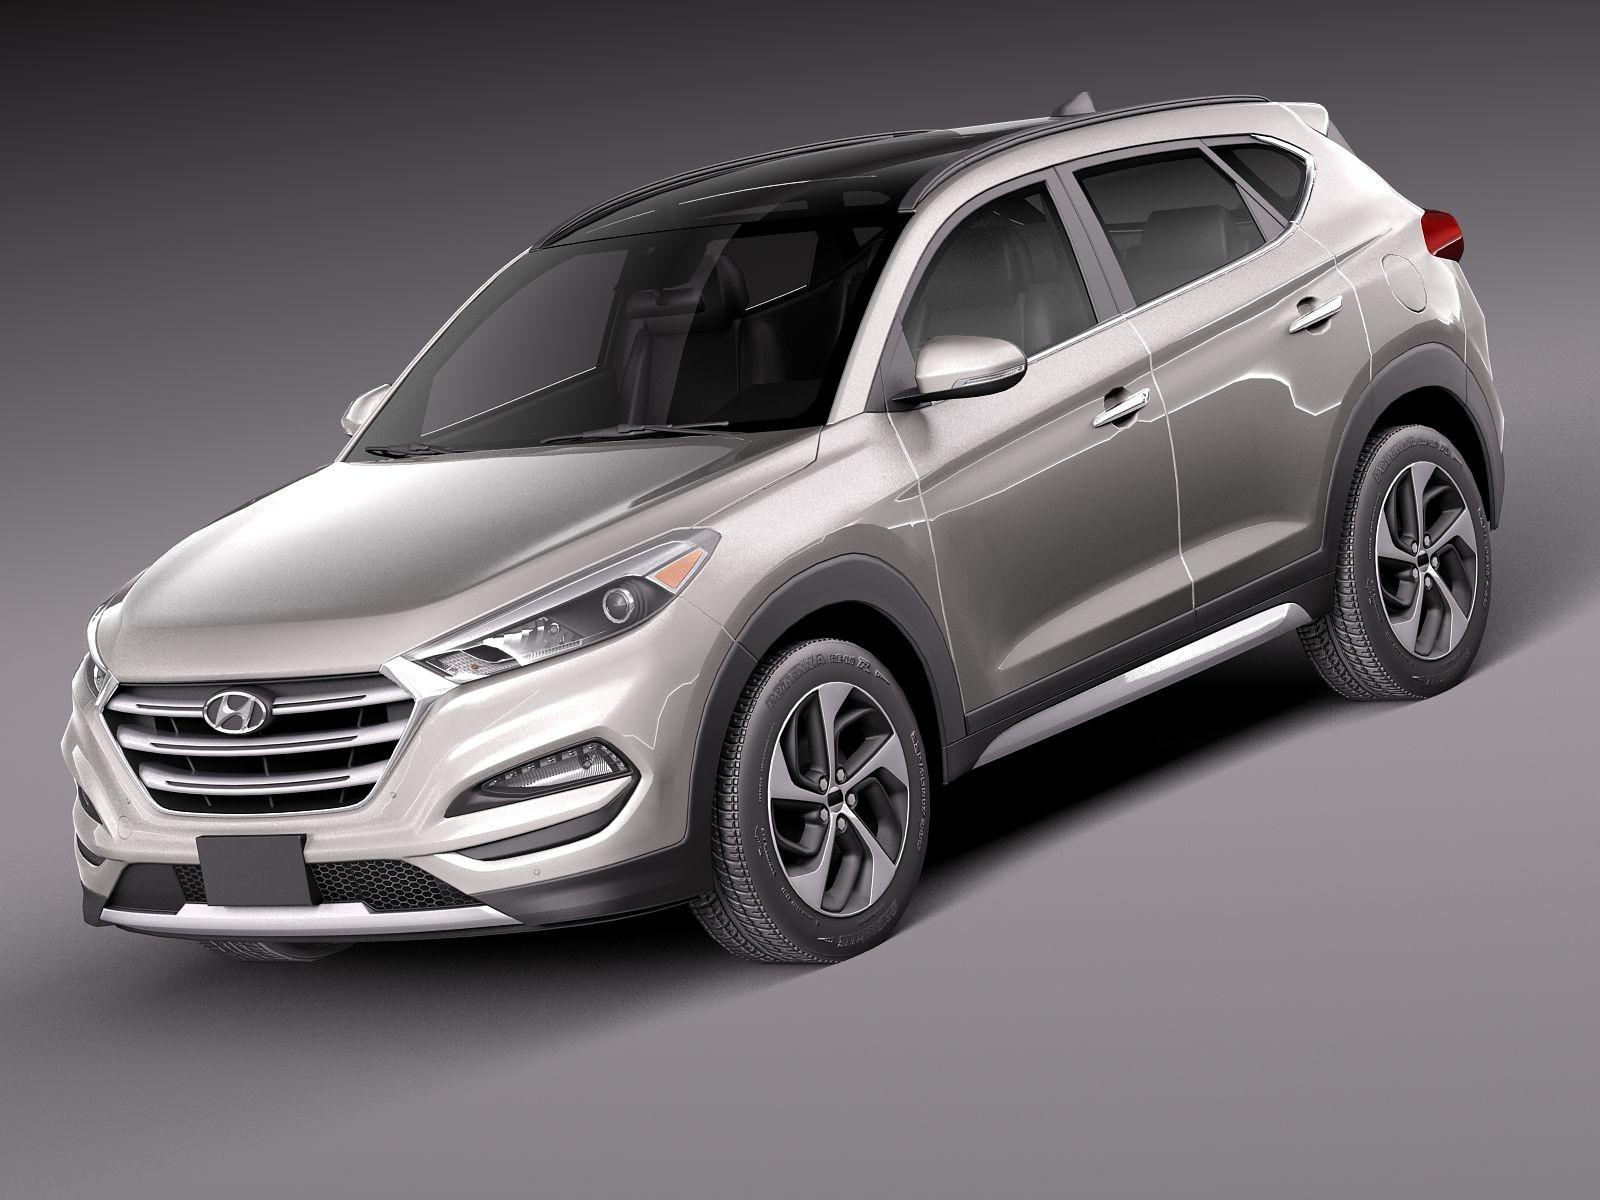 HQ Lowpoly Hyundai Tucson 2016